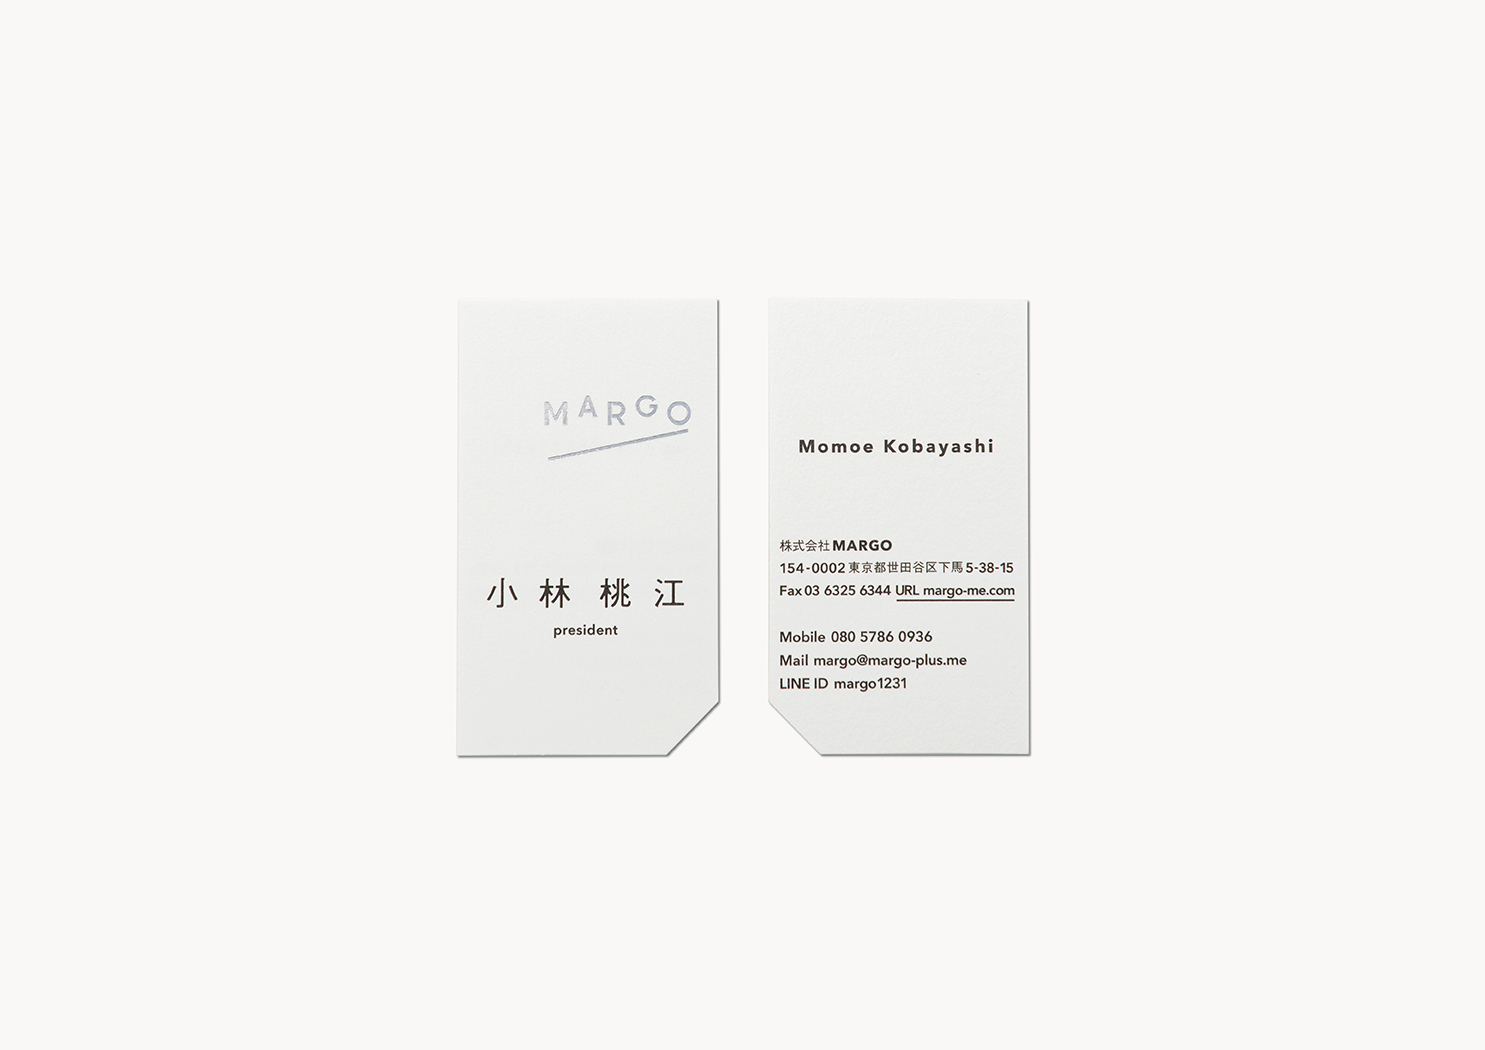 MARGO Business card